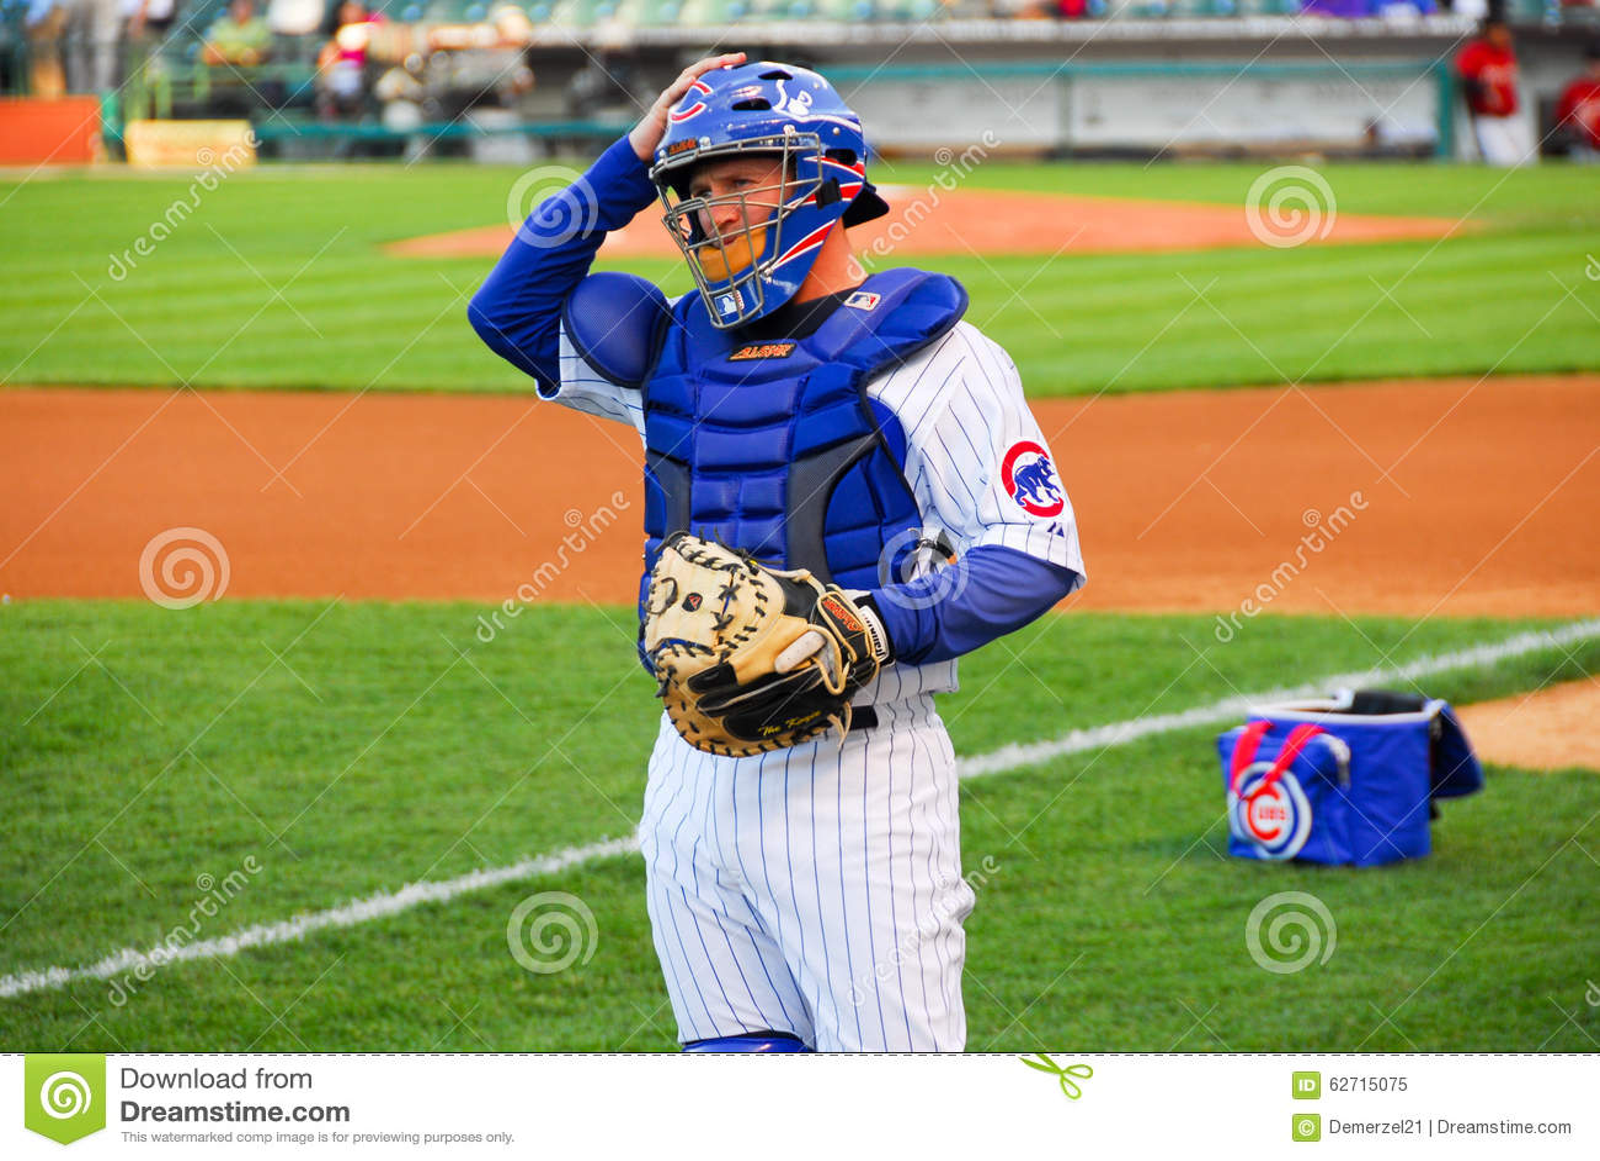 Download το Σικάγο Cubs το πεδίο Wrigley Εκδοτική εικόνα - εικόνα από catcher, ξάδελφος: 62715075